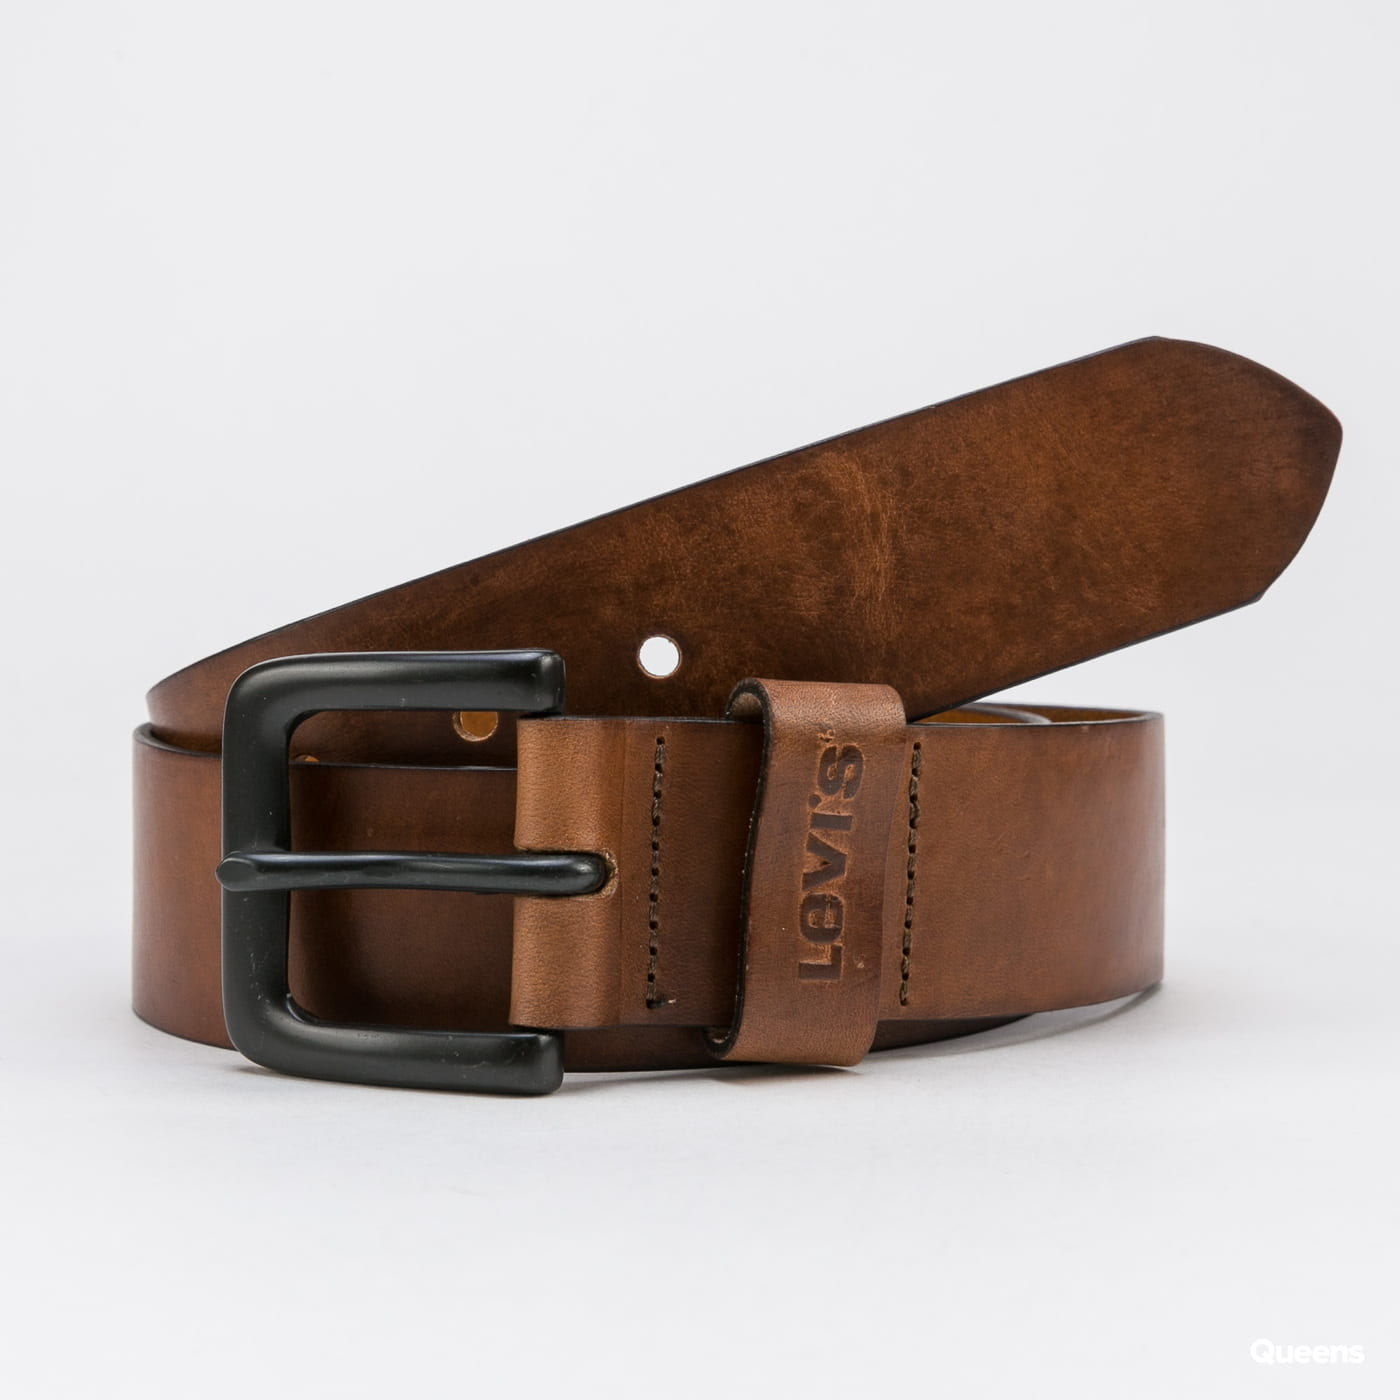 Levi's ® 2 Horse Belt brown